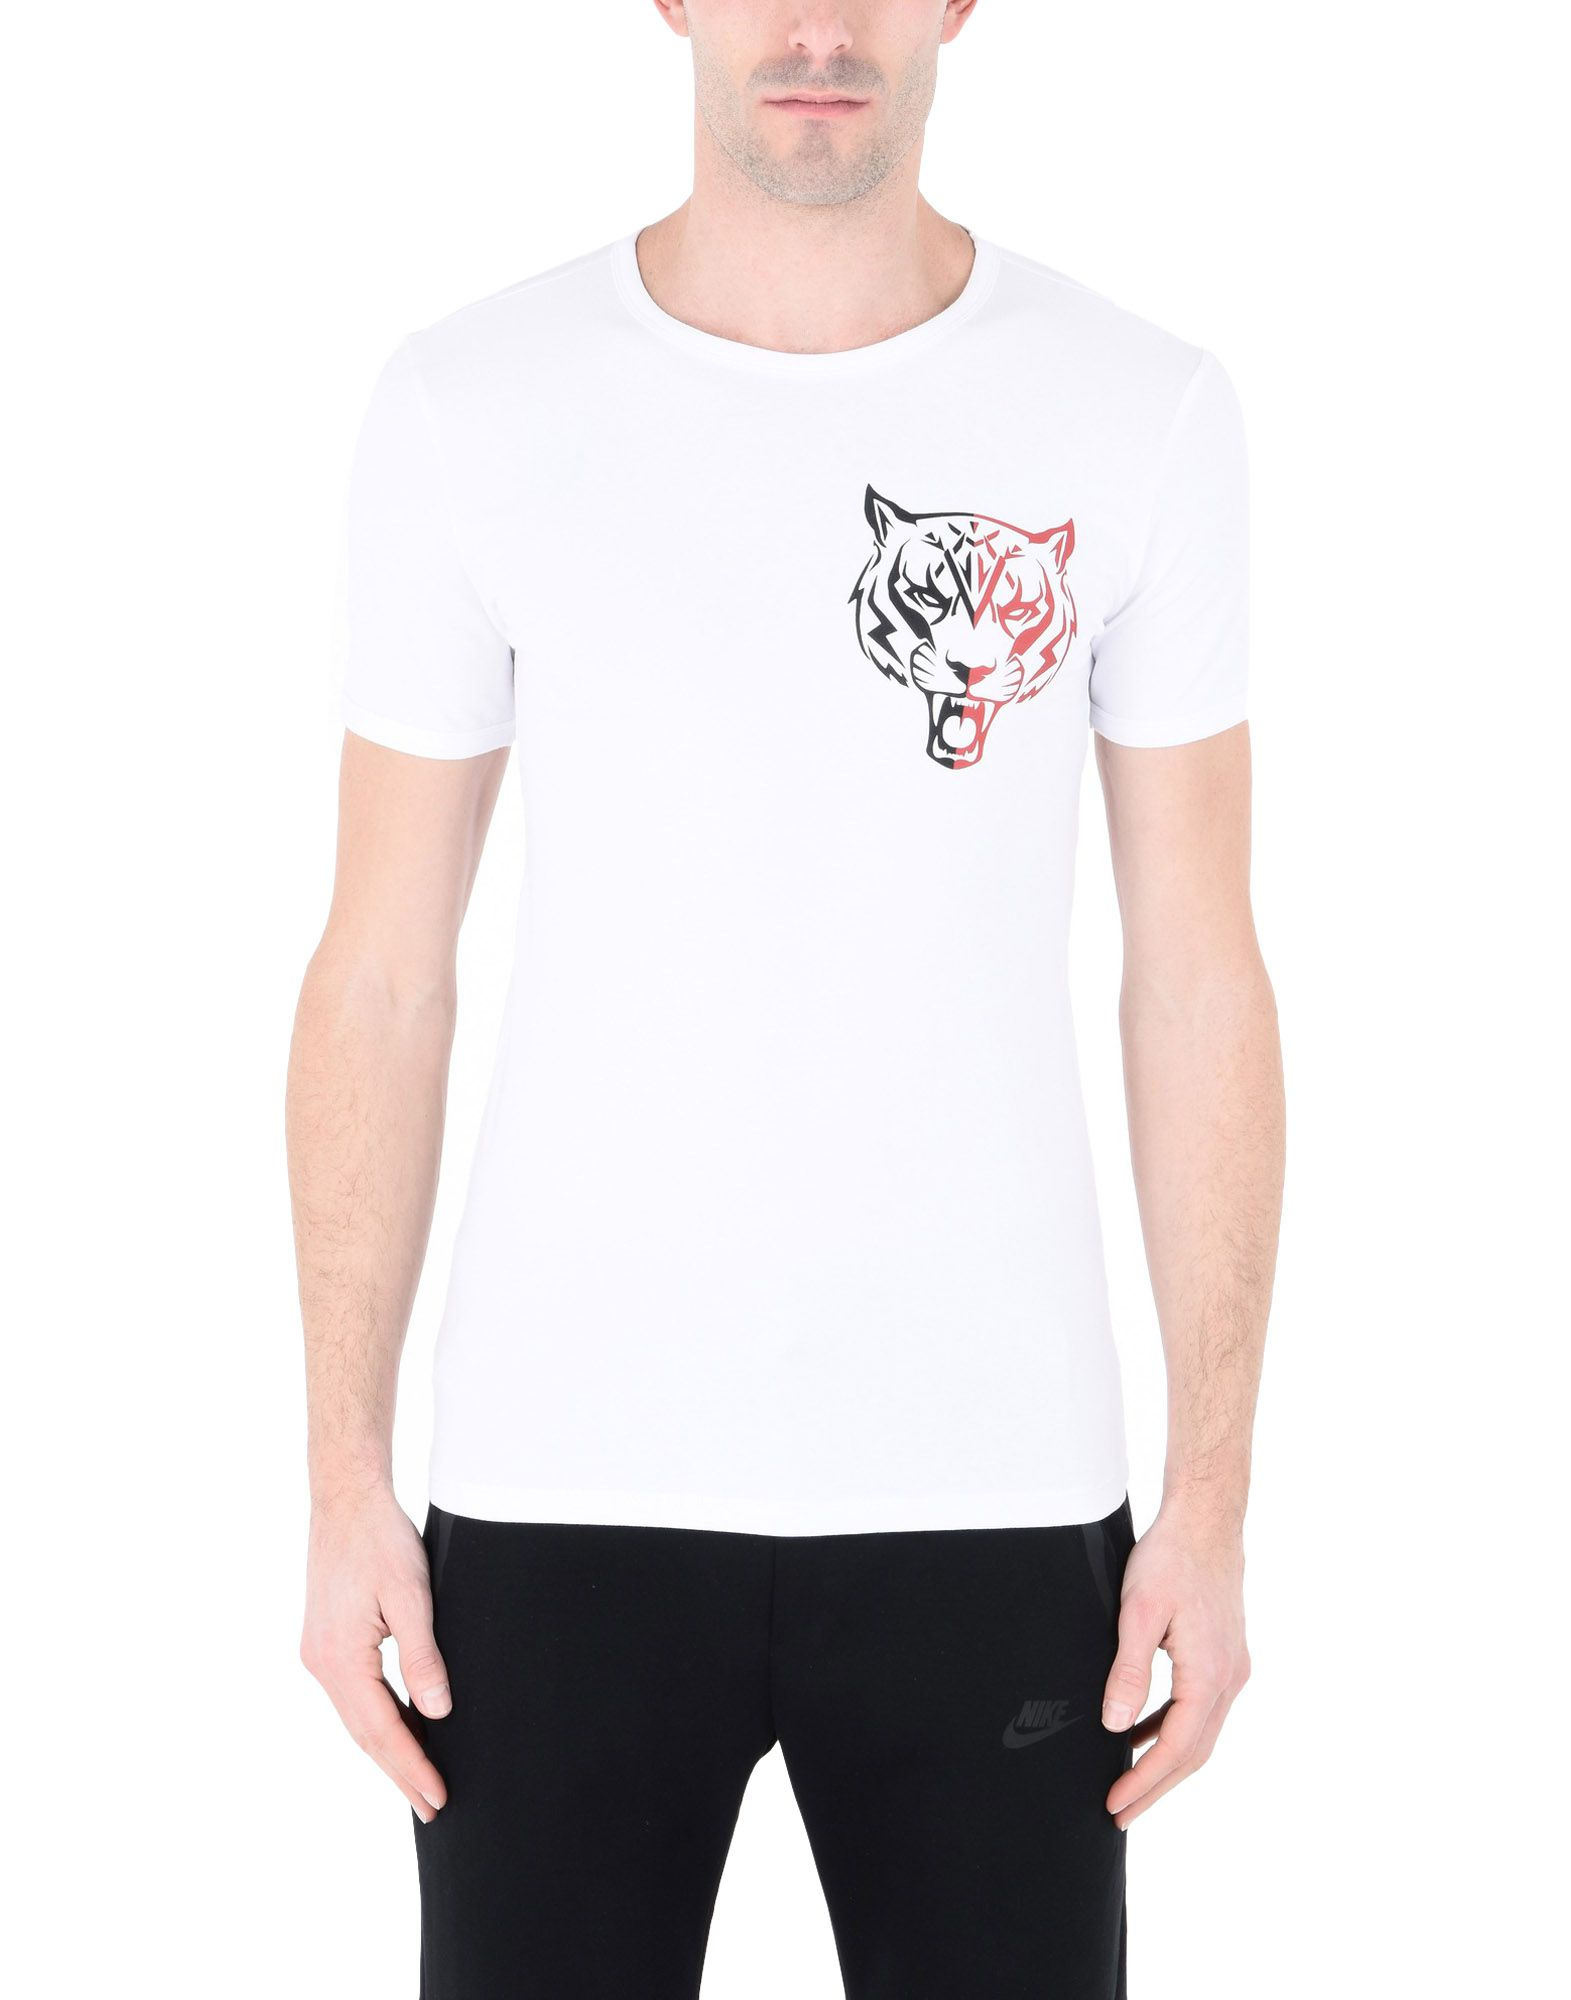 T-Shirt Sportiva Plein Sport T-Shirt Basic Tiger - 12136396UM Uomo - 12136396UM - c37bbe